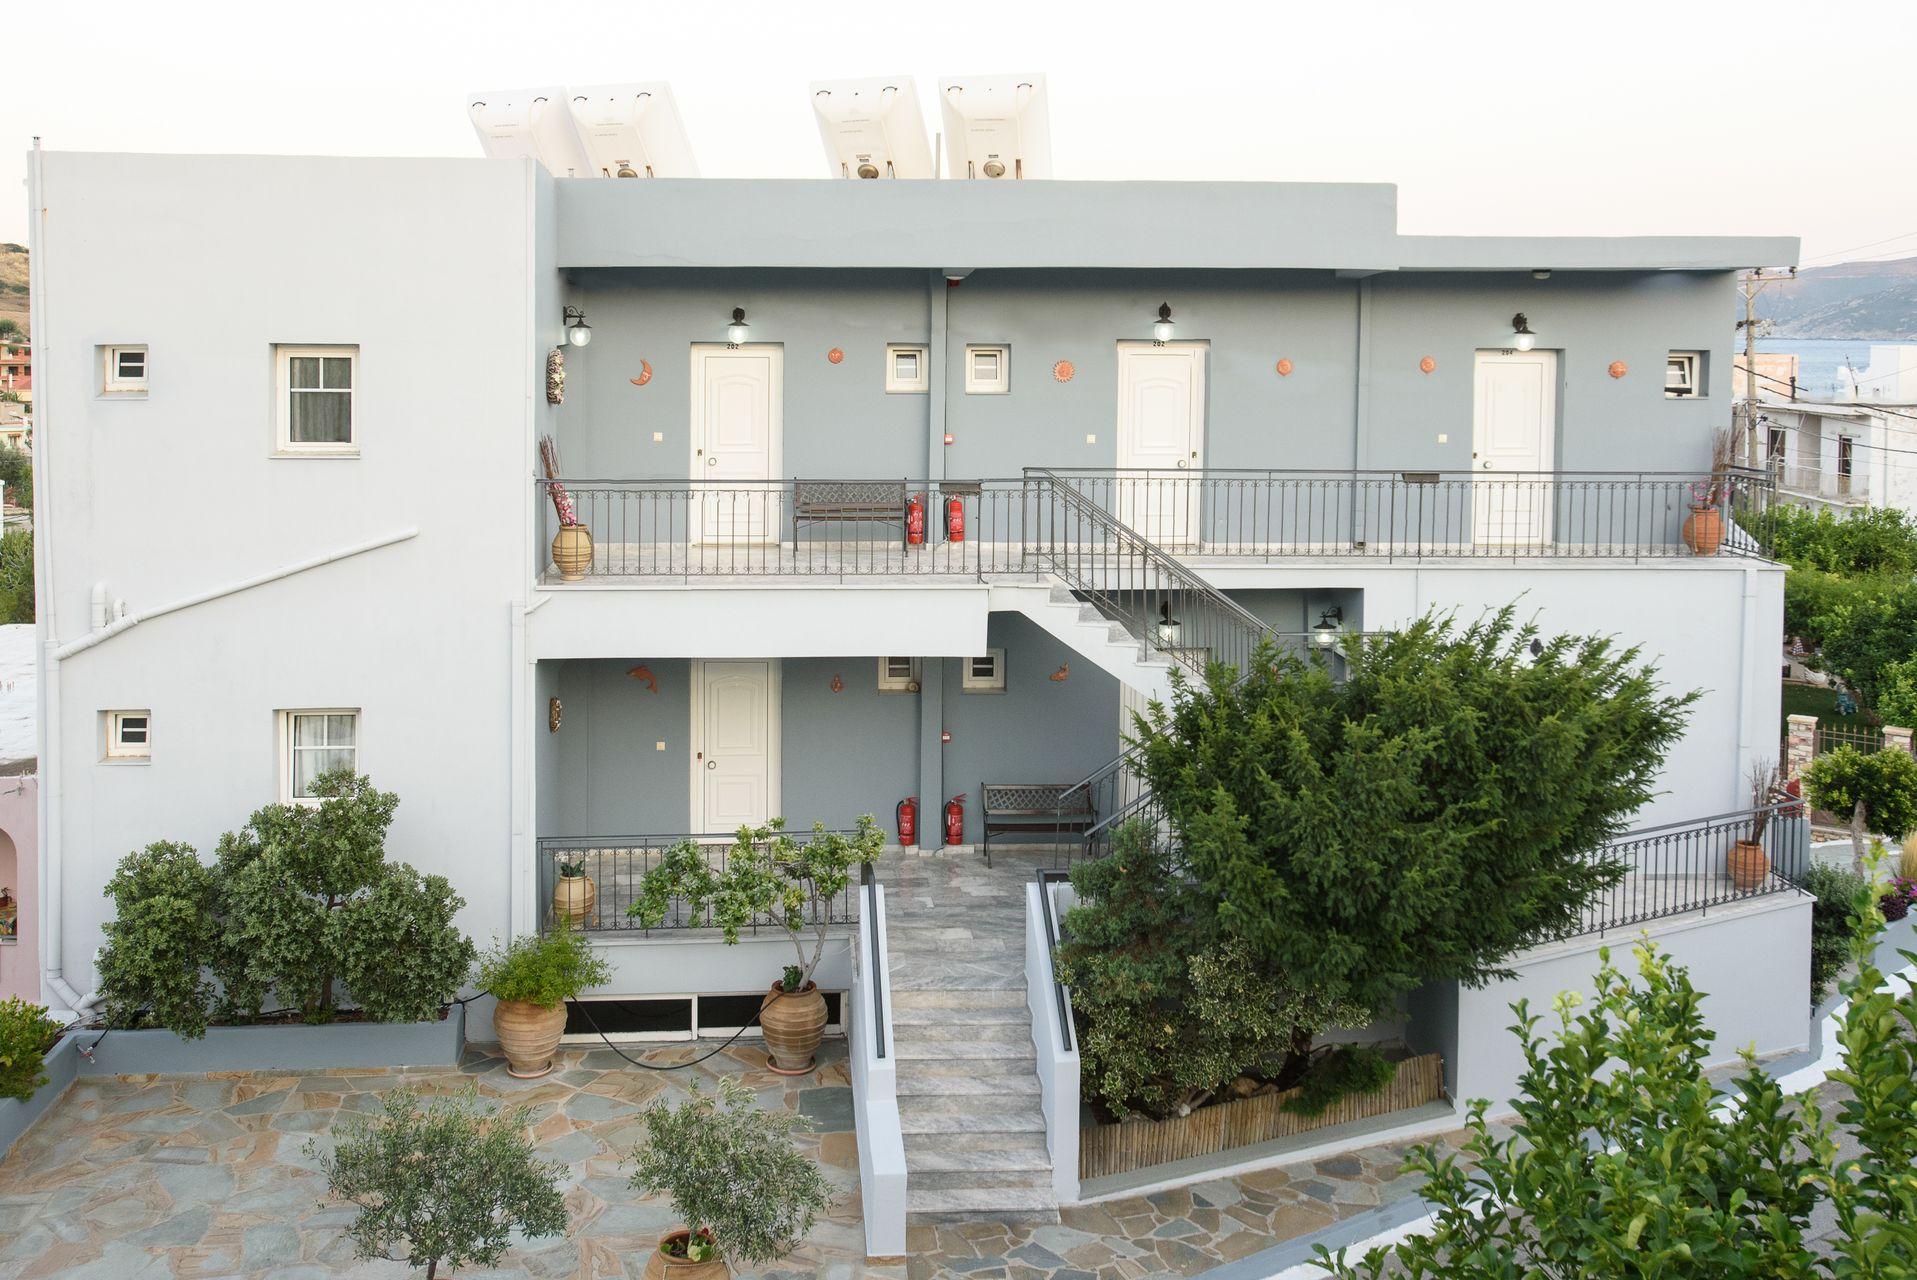 _remvi apartments-0003_resized